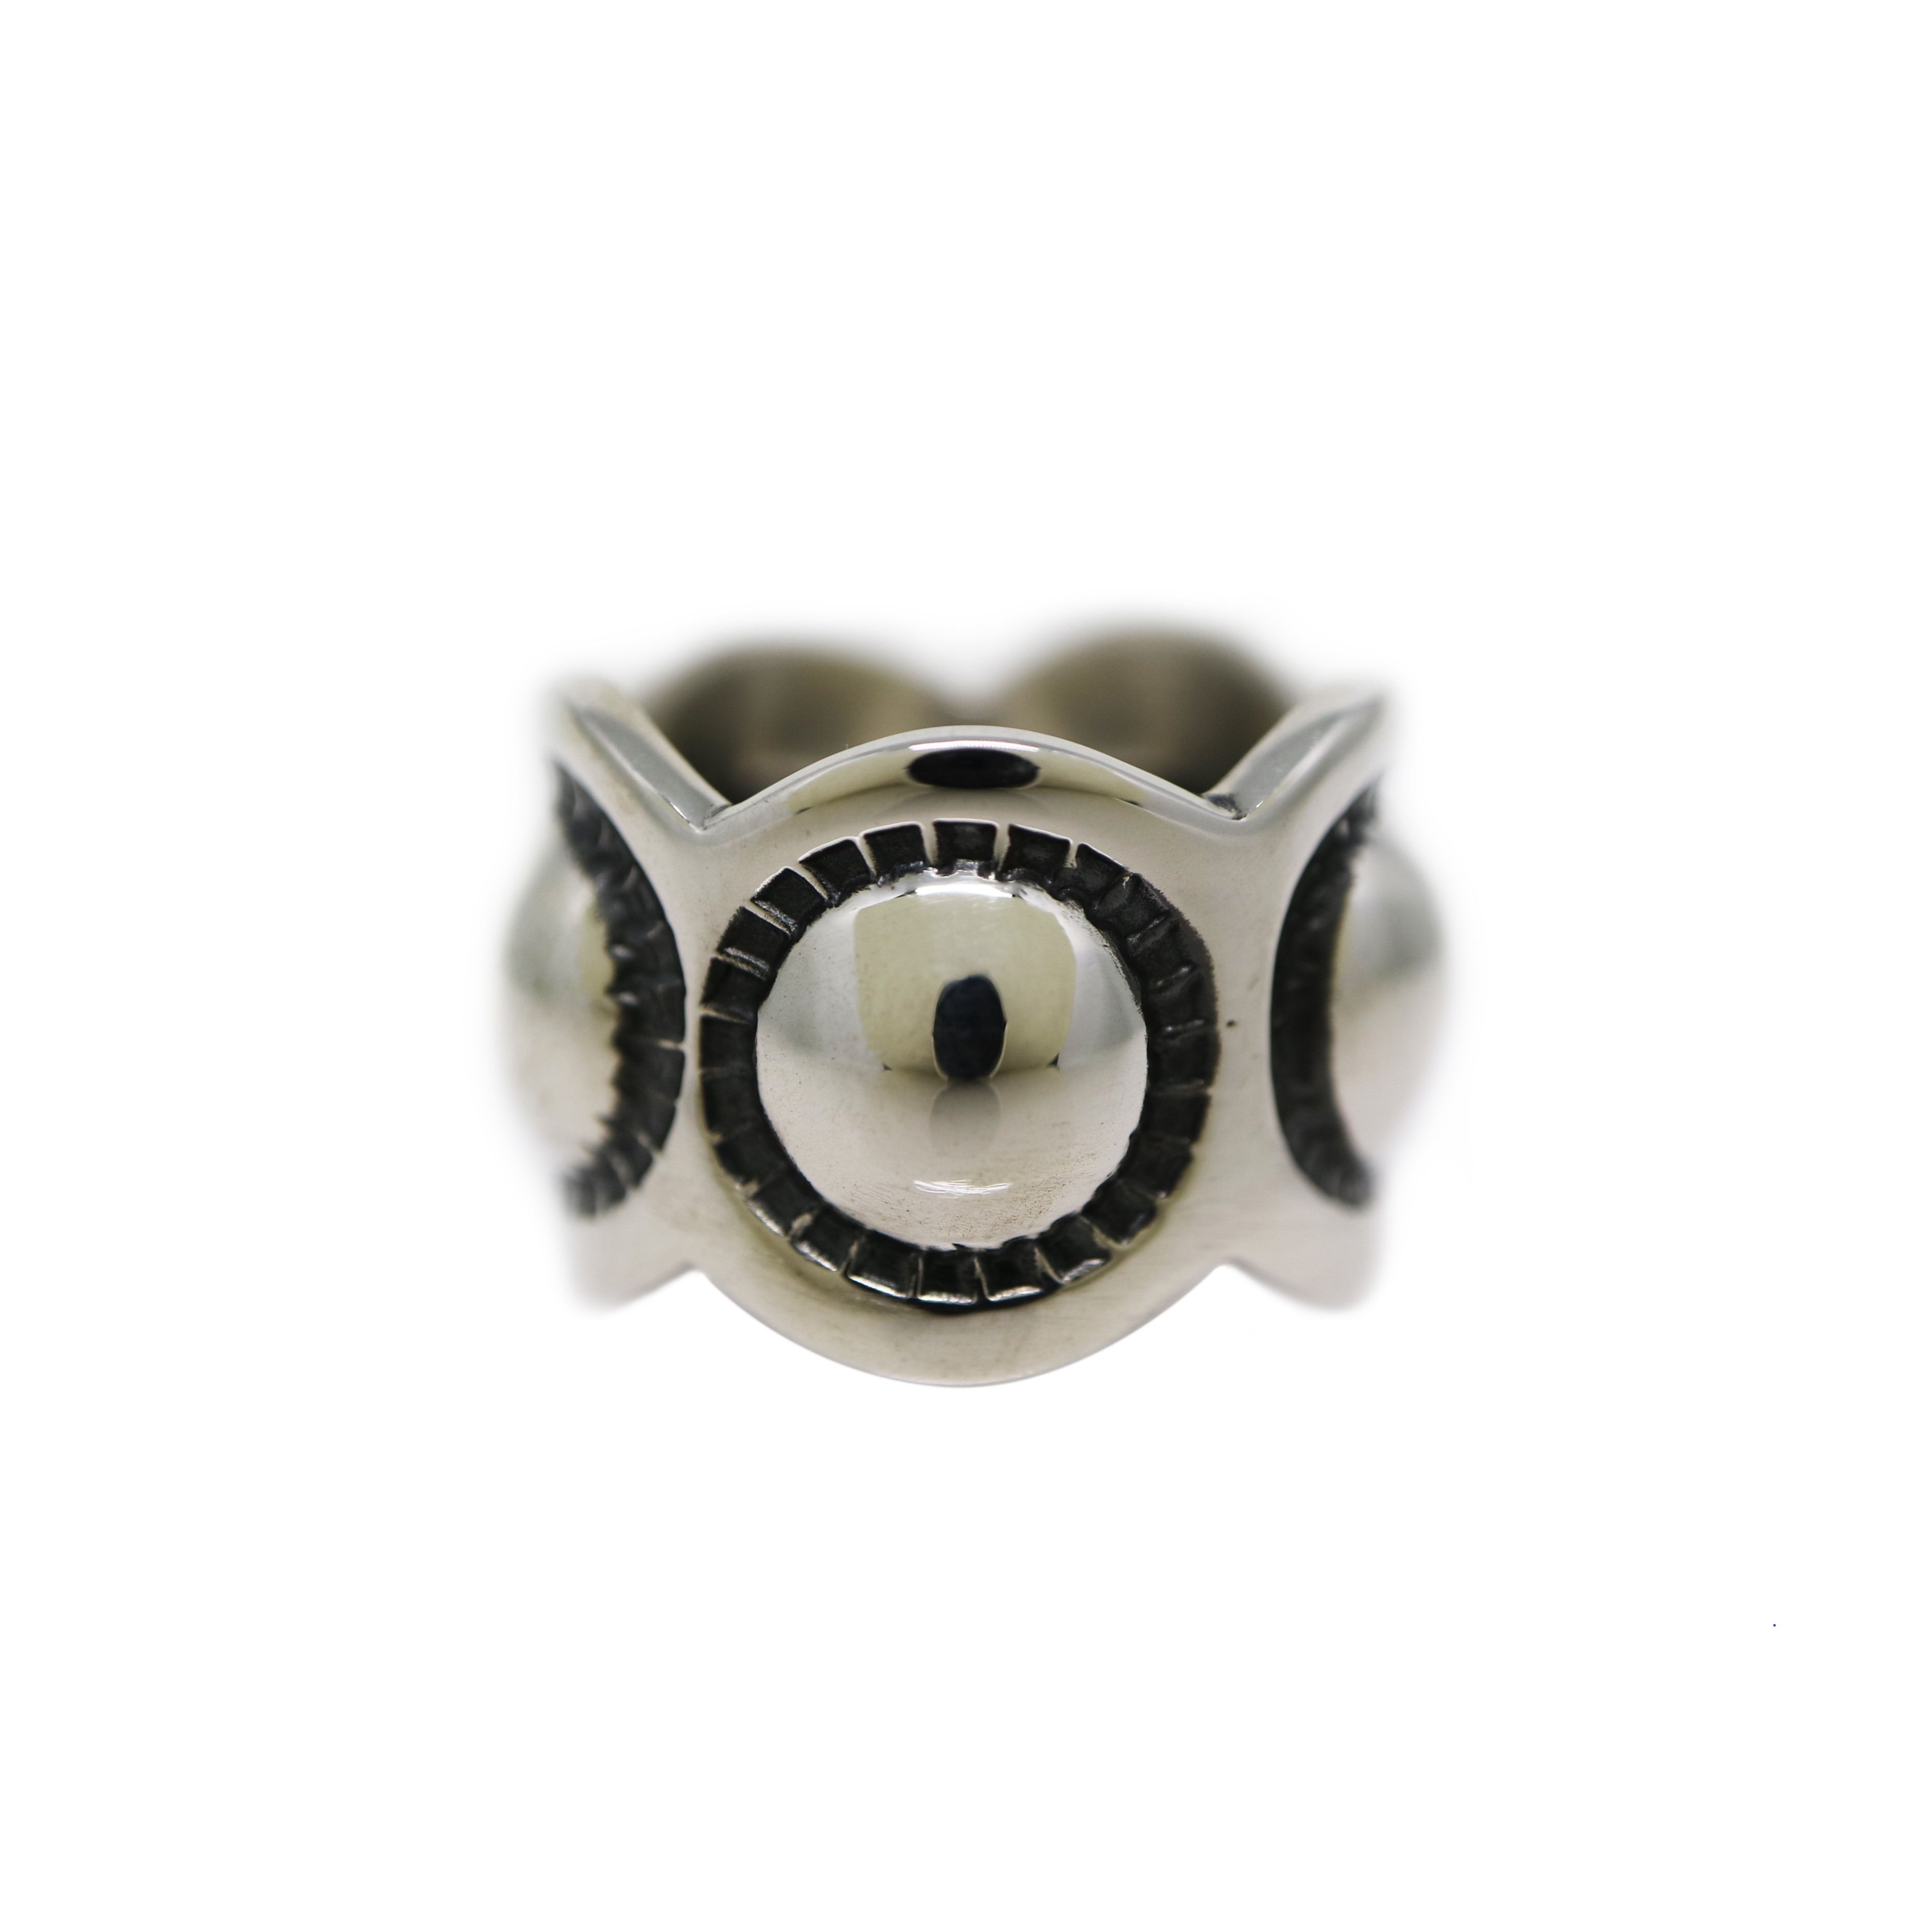 MOON SWEET PEA W / SCALLOPED EDGE RING [USD $650]